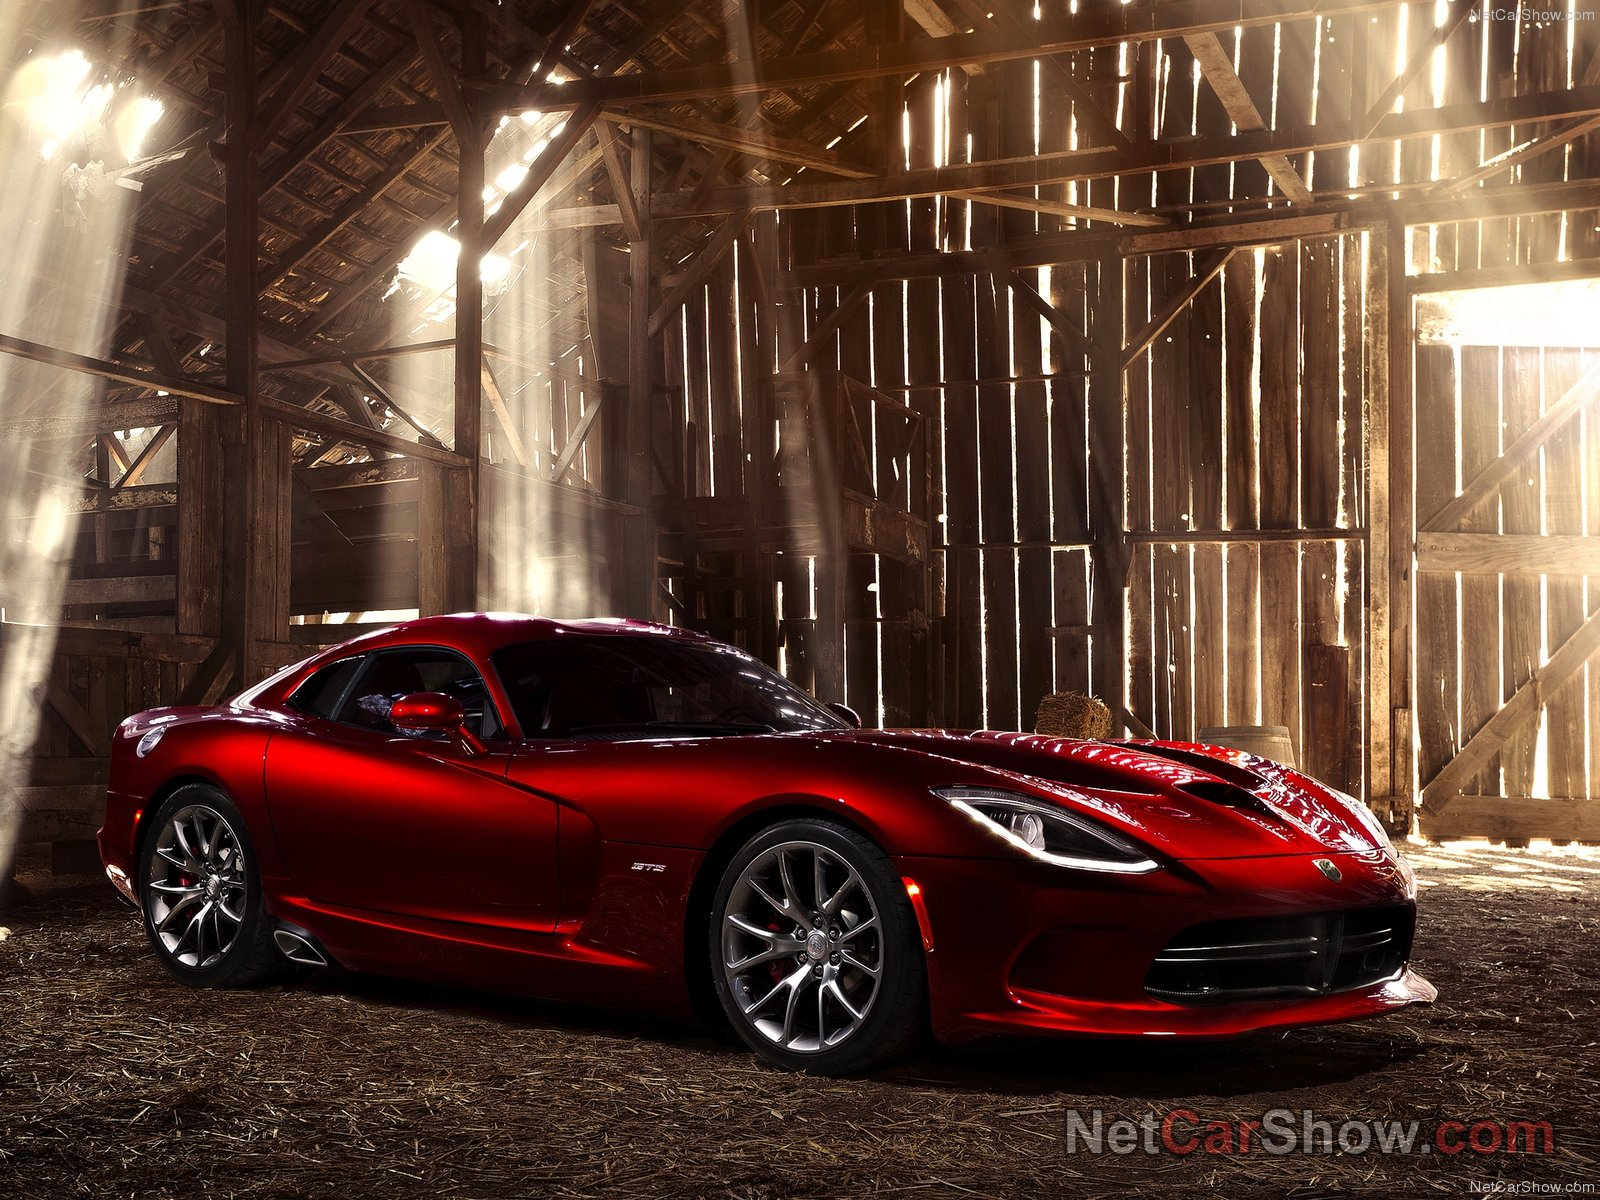 Dodge Viper Srt Red Wallpaper 1600x1200px